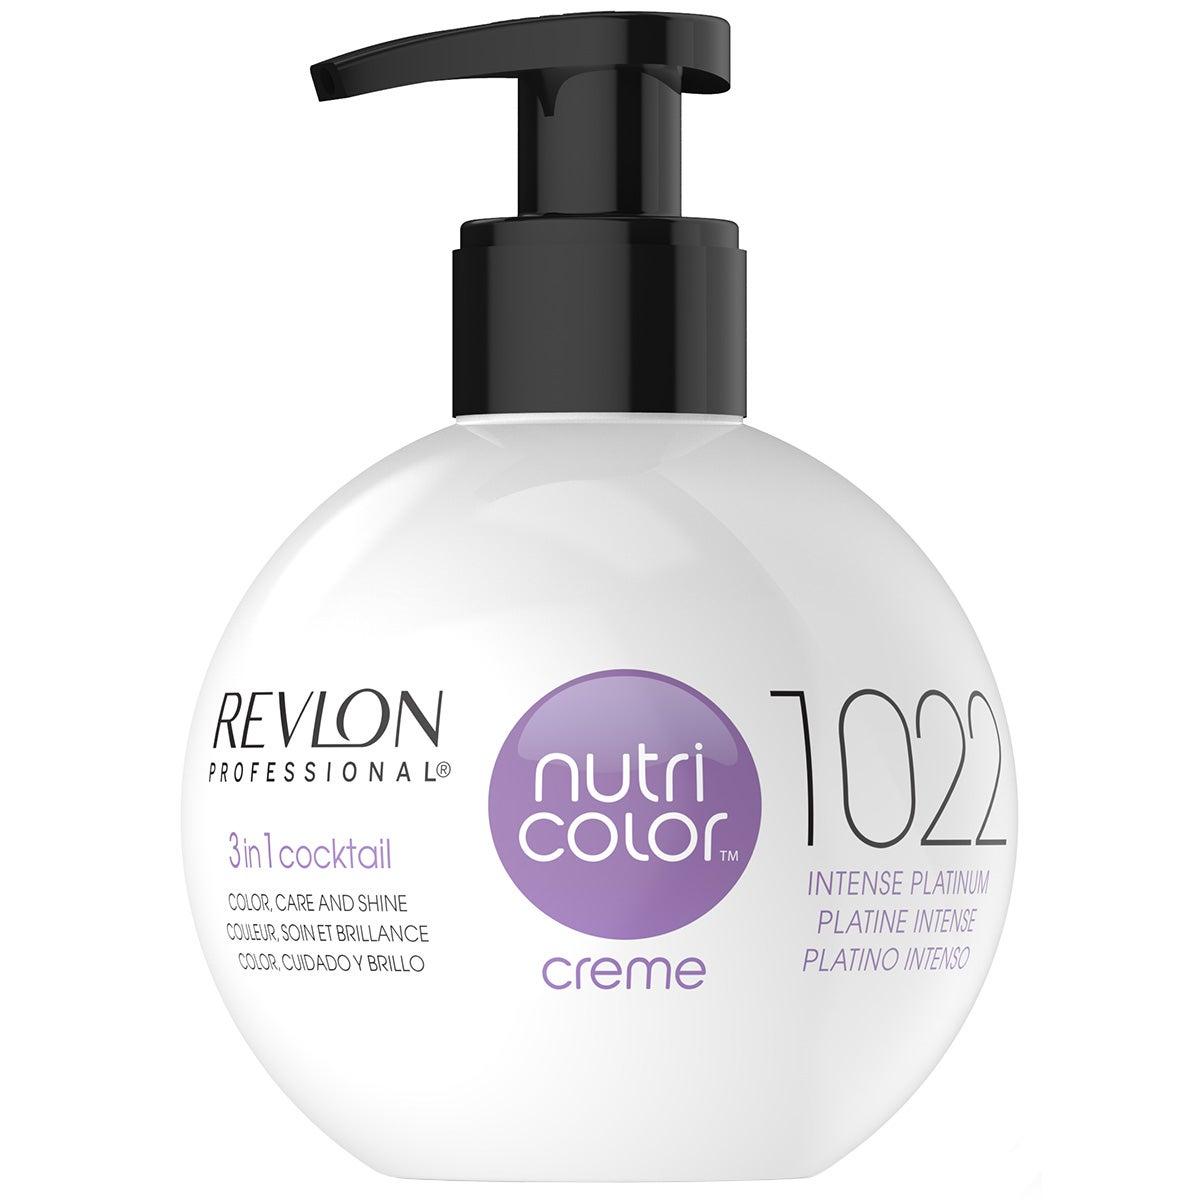 Nutri Color Creme 1022 Intense Platinum 100 ml Revlon Professional Alla hårfärger